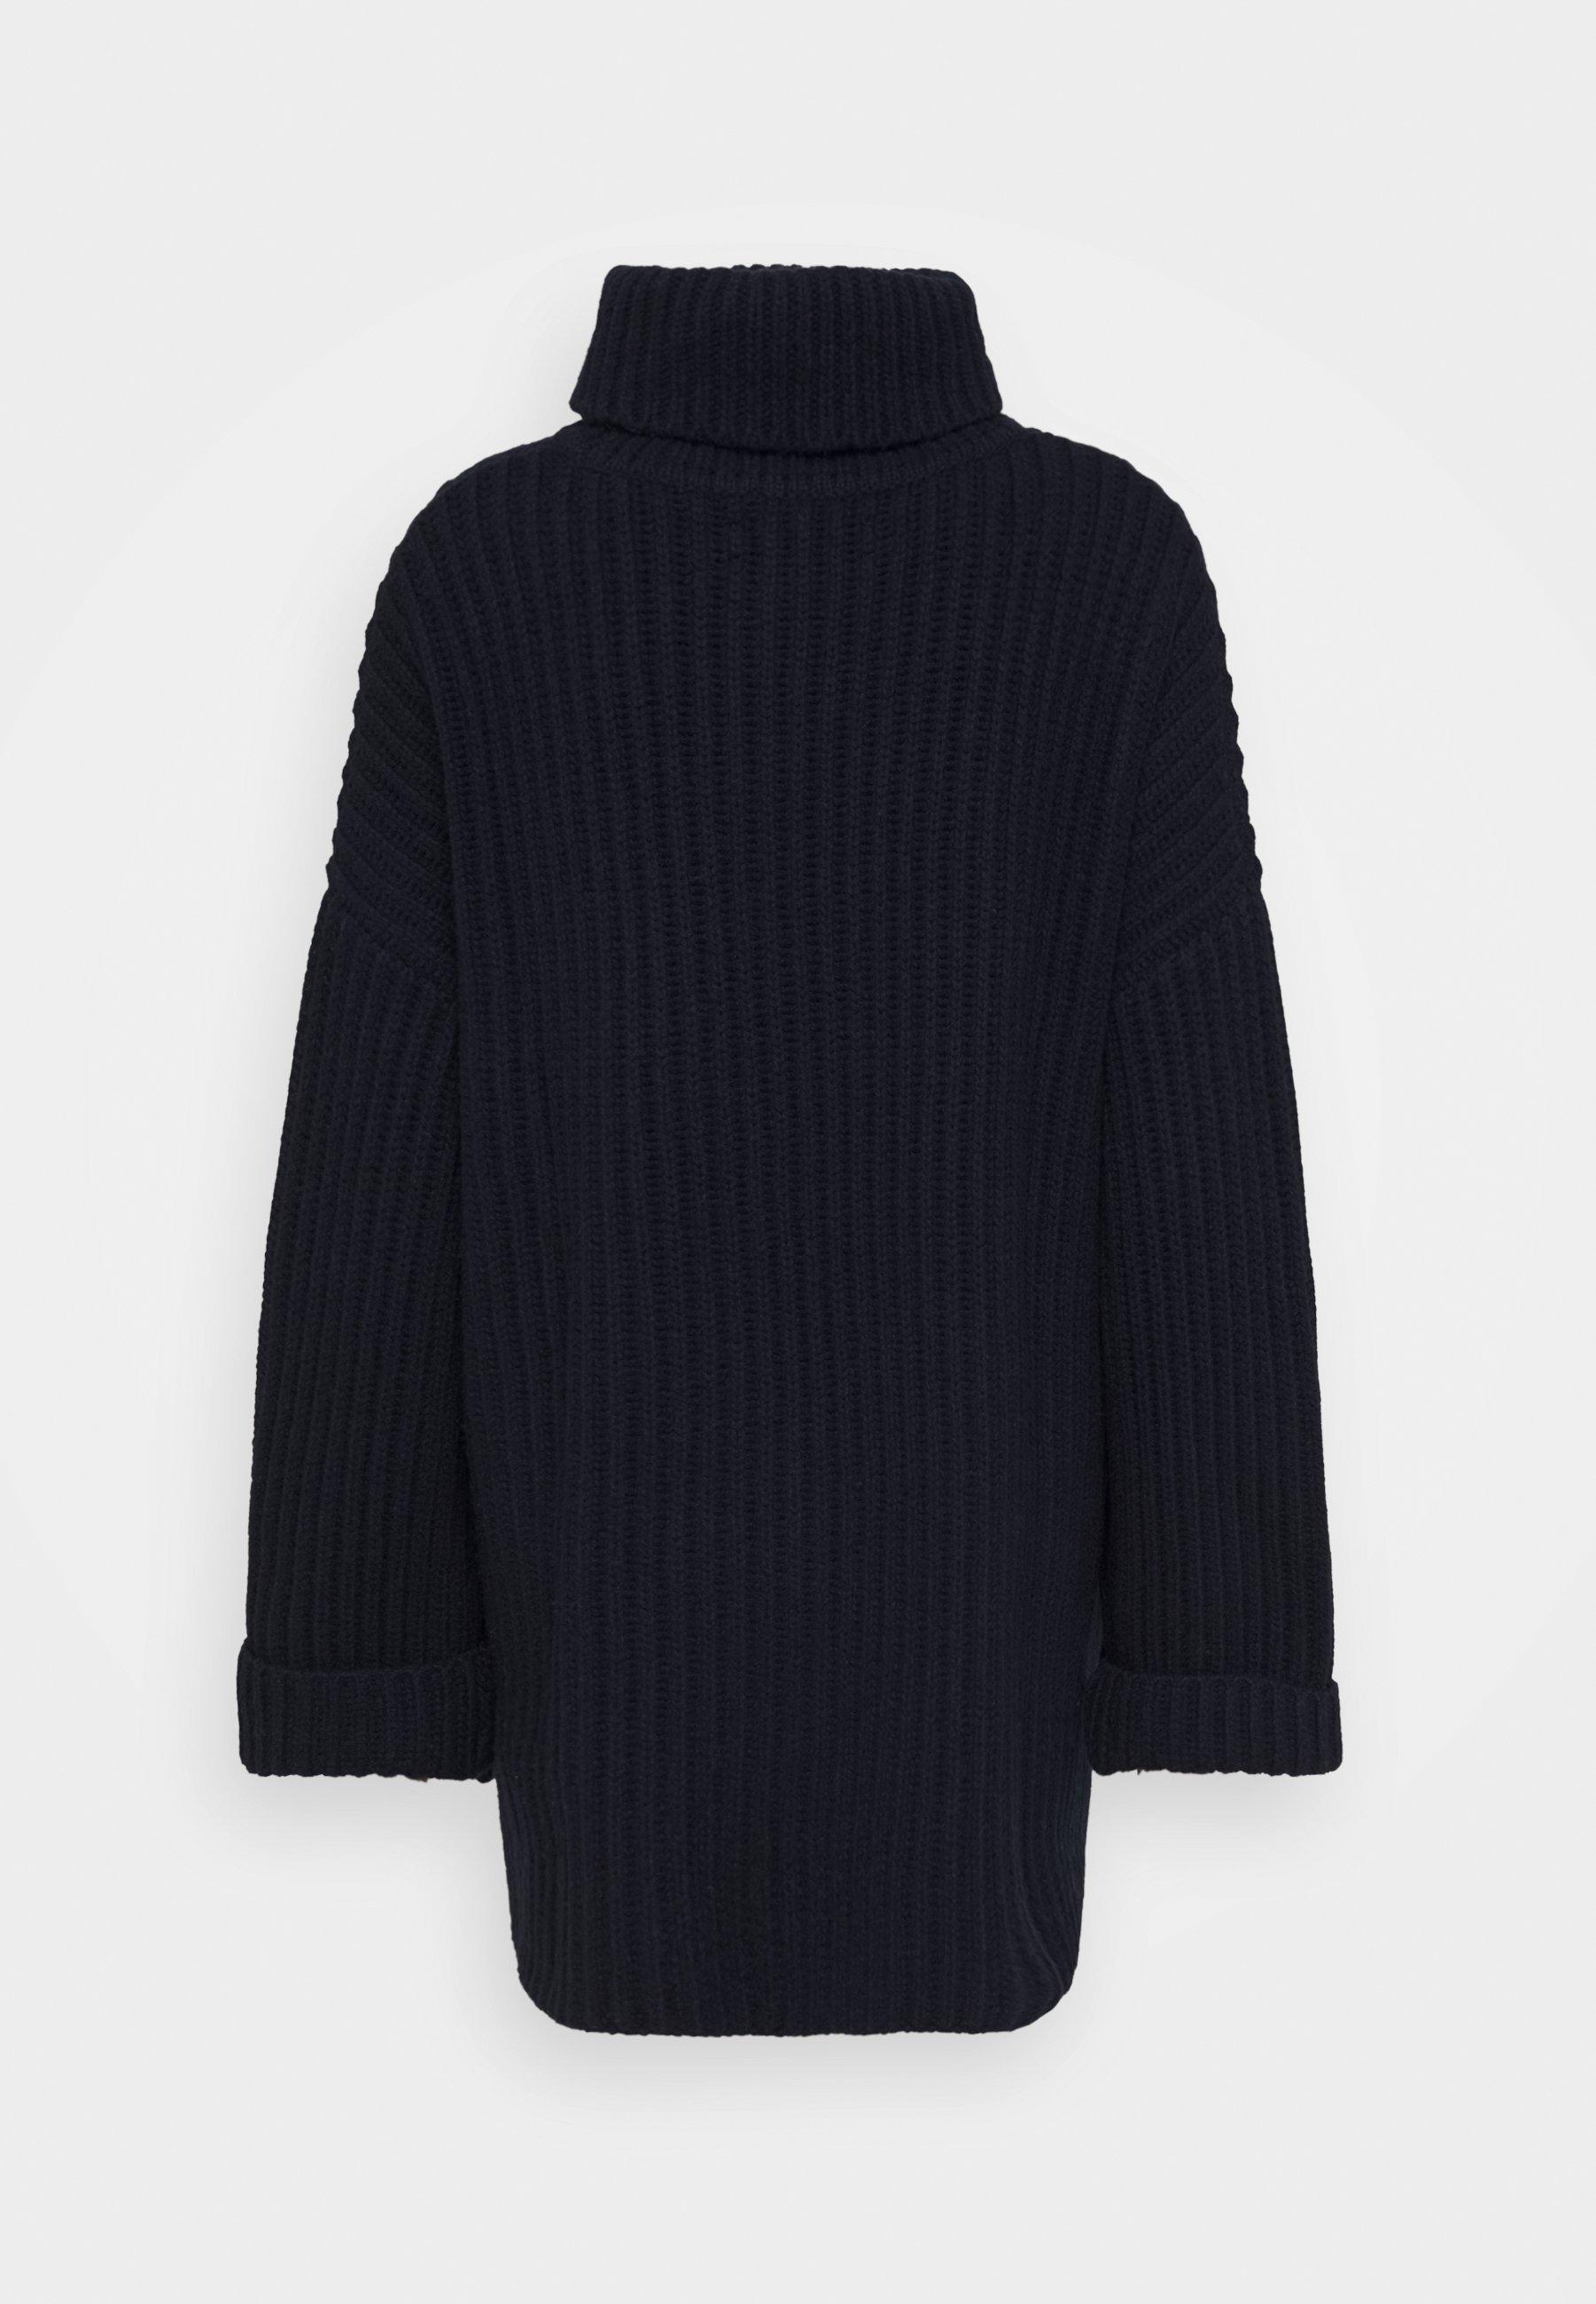 Samsøe Keiko Turtleneck - Pullover Sky Captain